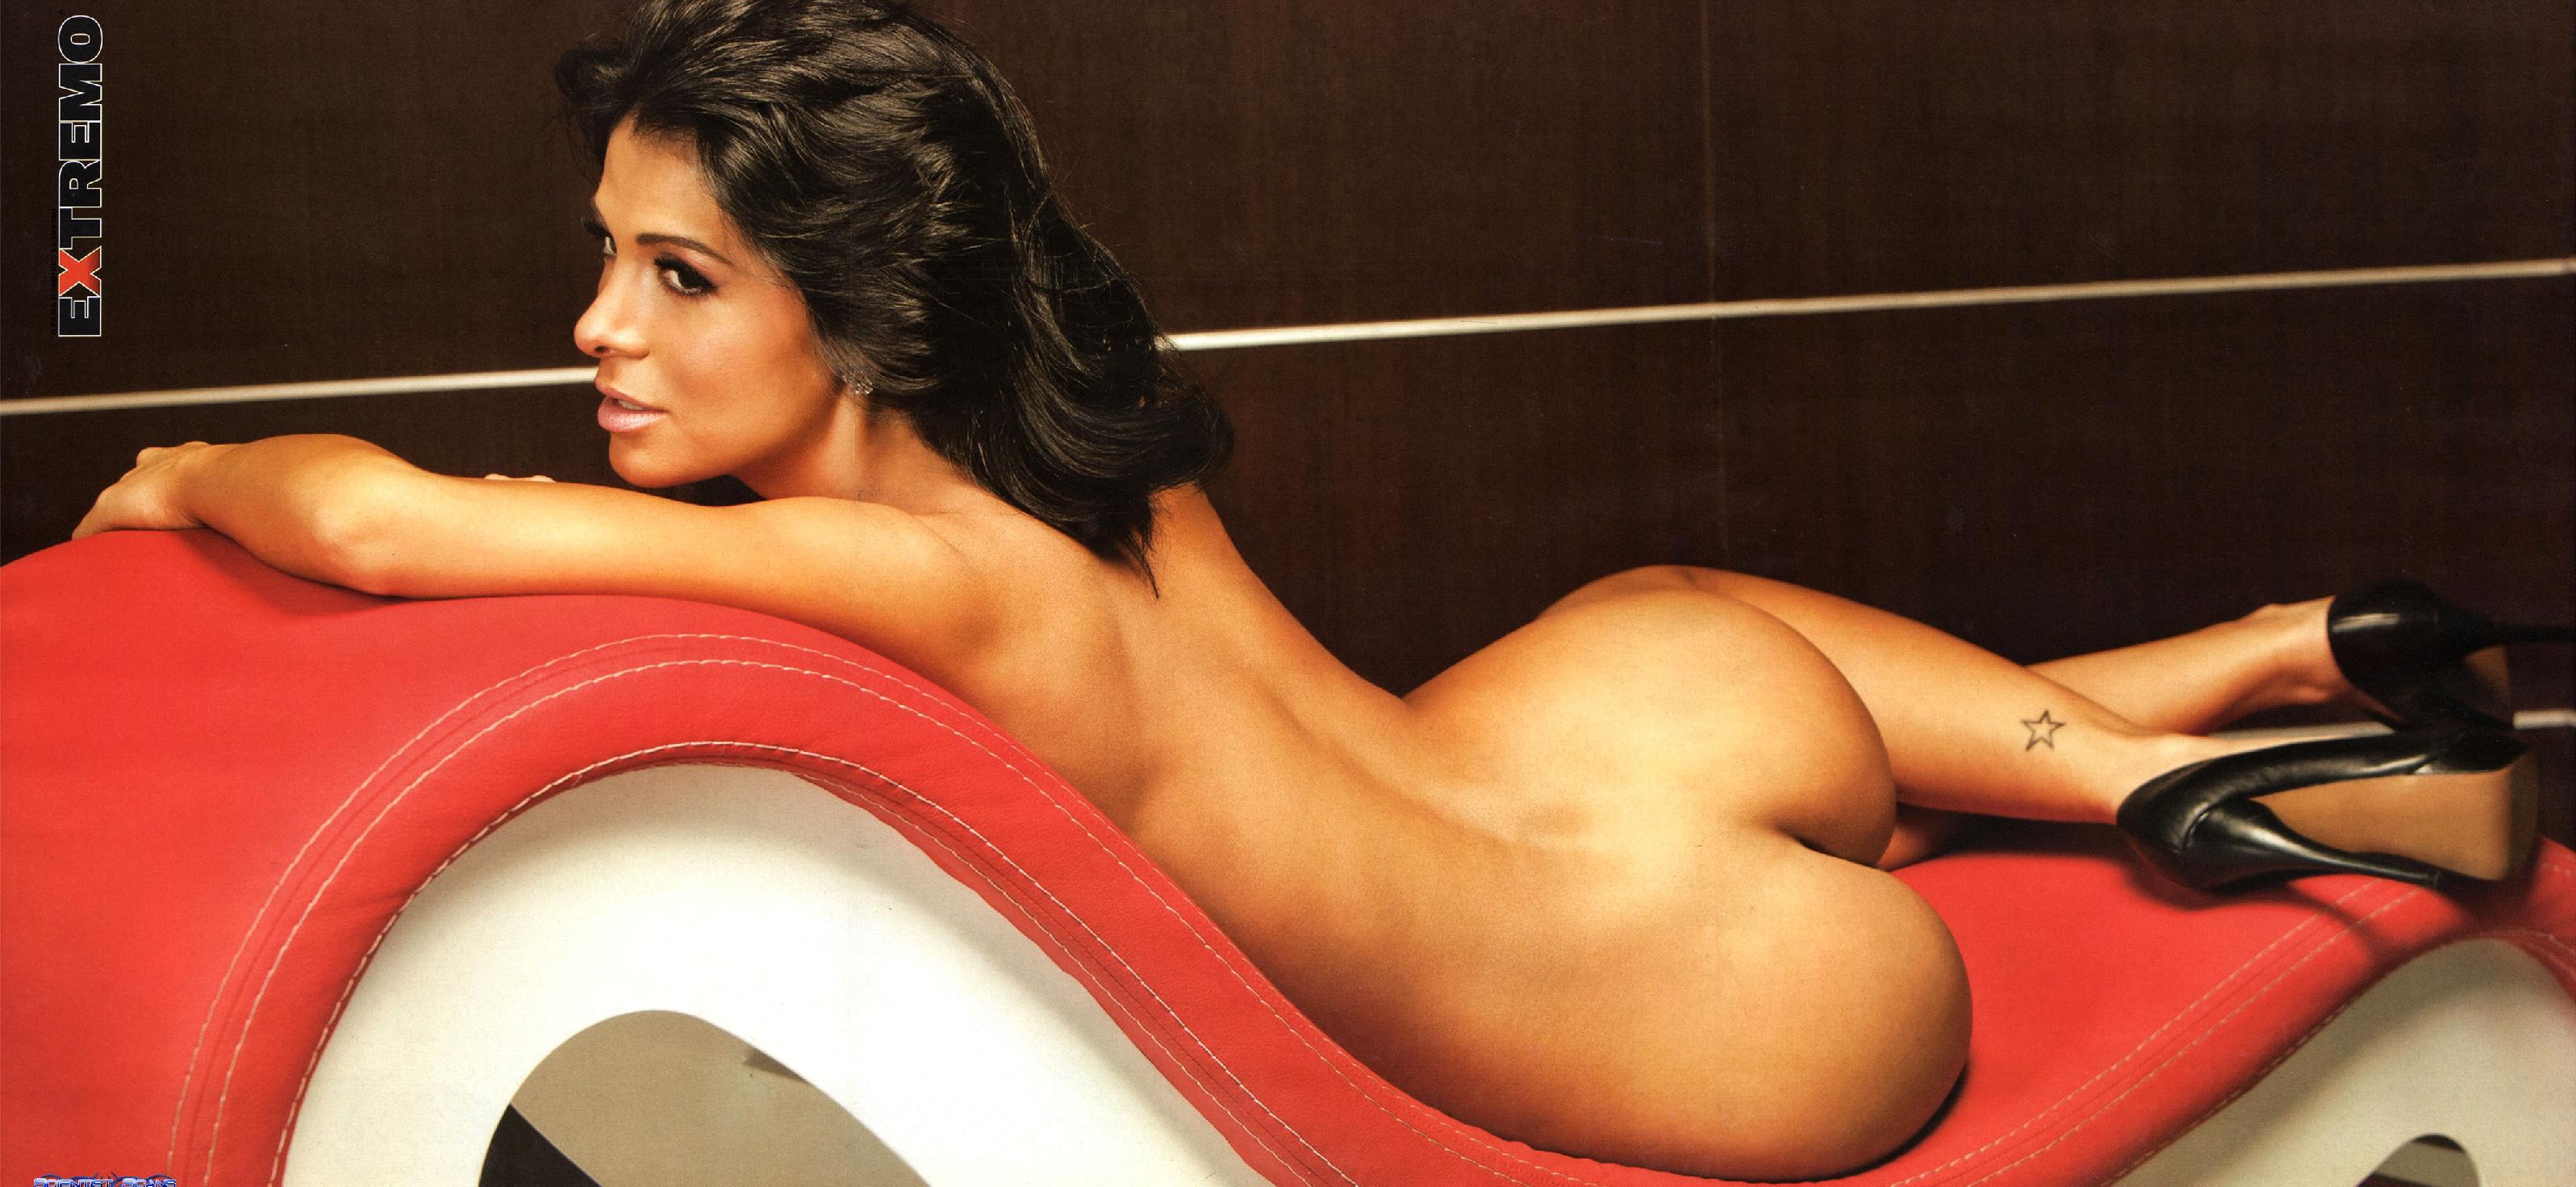 Vanessa branch desnuda, boi pussy gif